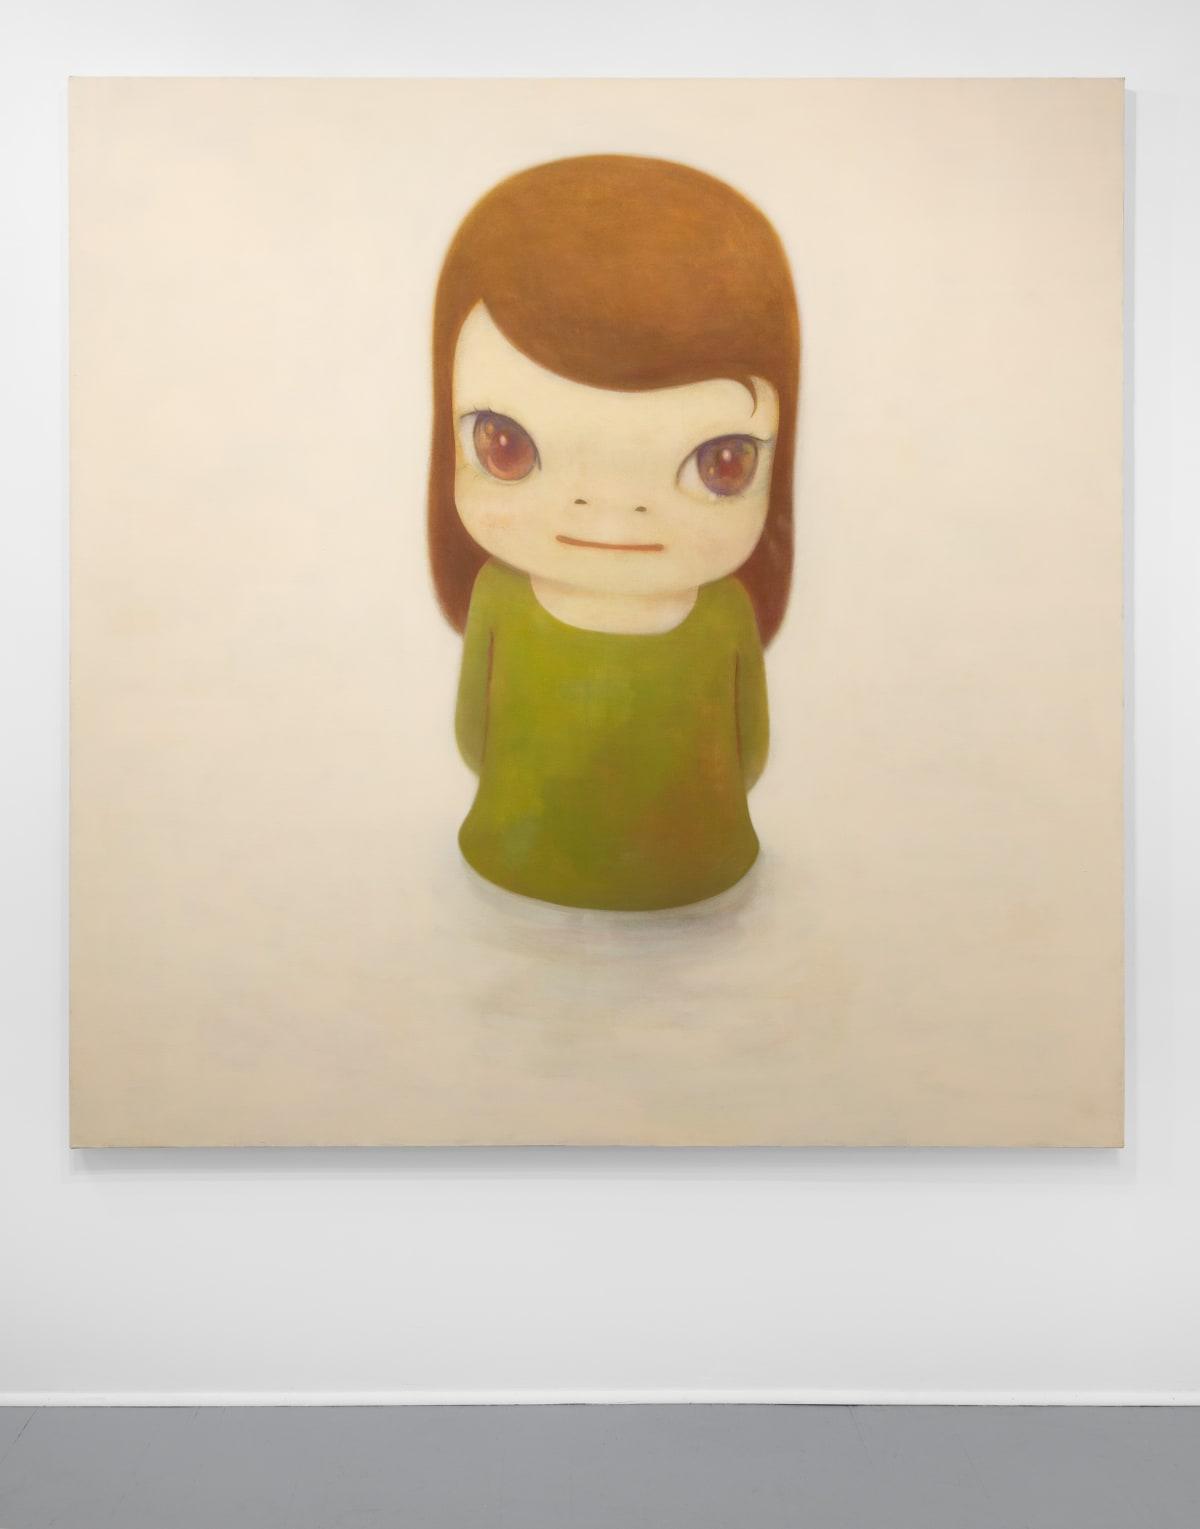 Yoshitomo Nara In the Milky Lake, 2012 Acrylic on canvas 77 1/2 x 76 3/8 in (196.8 x 194 cm) © YOSHITOMO NARA